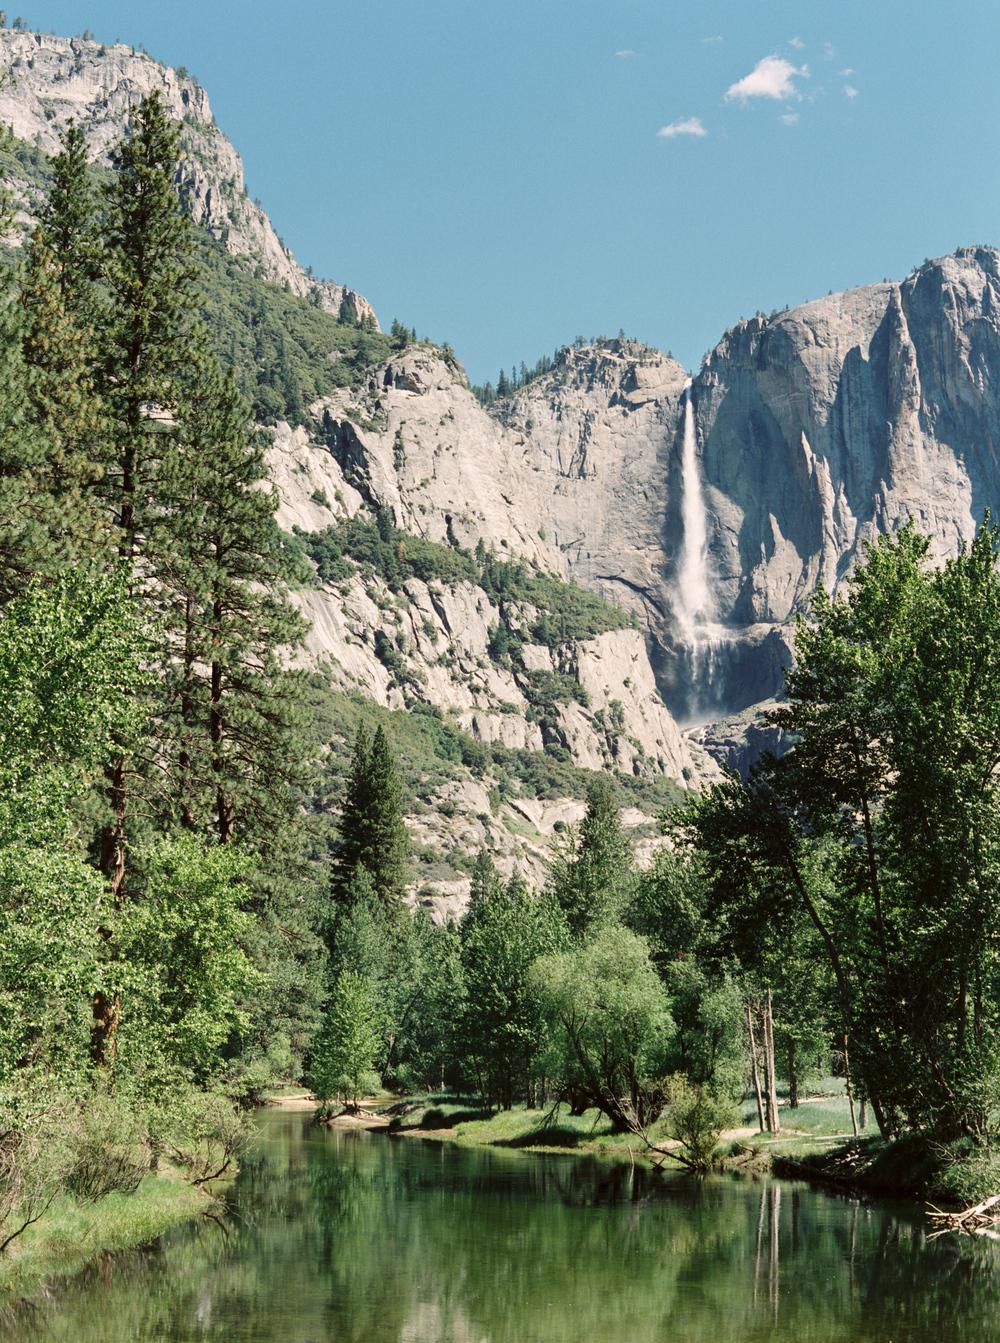 cassidy_carson_contax645_fuji400_yosemite_national_park_california_photovision.jpg